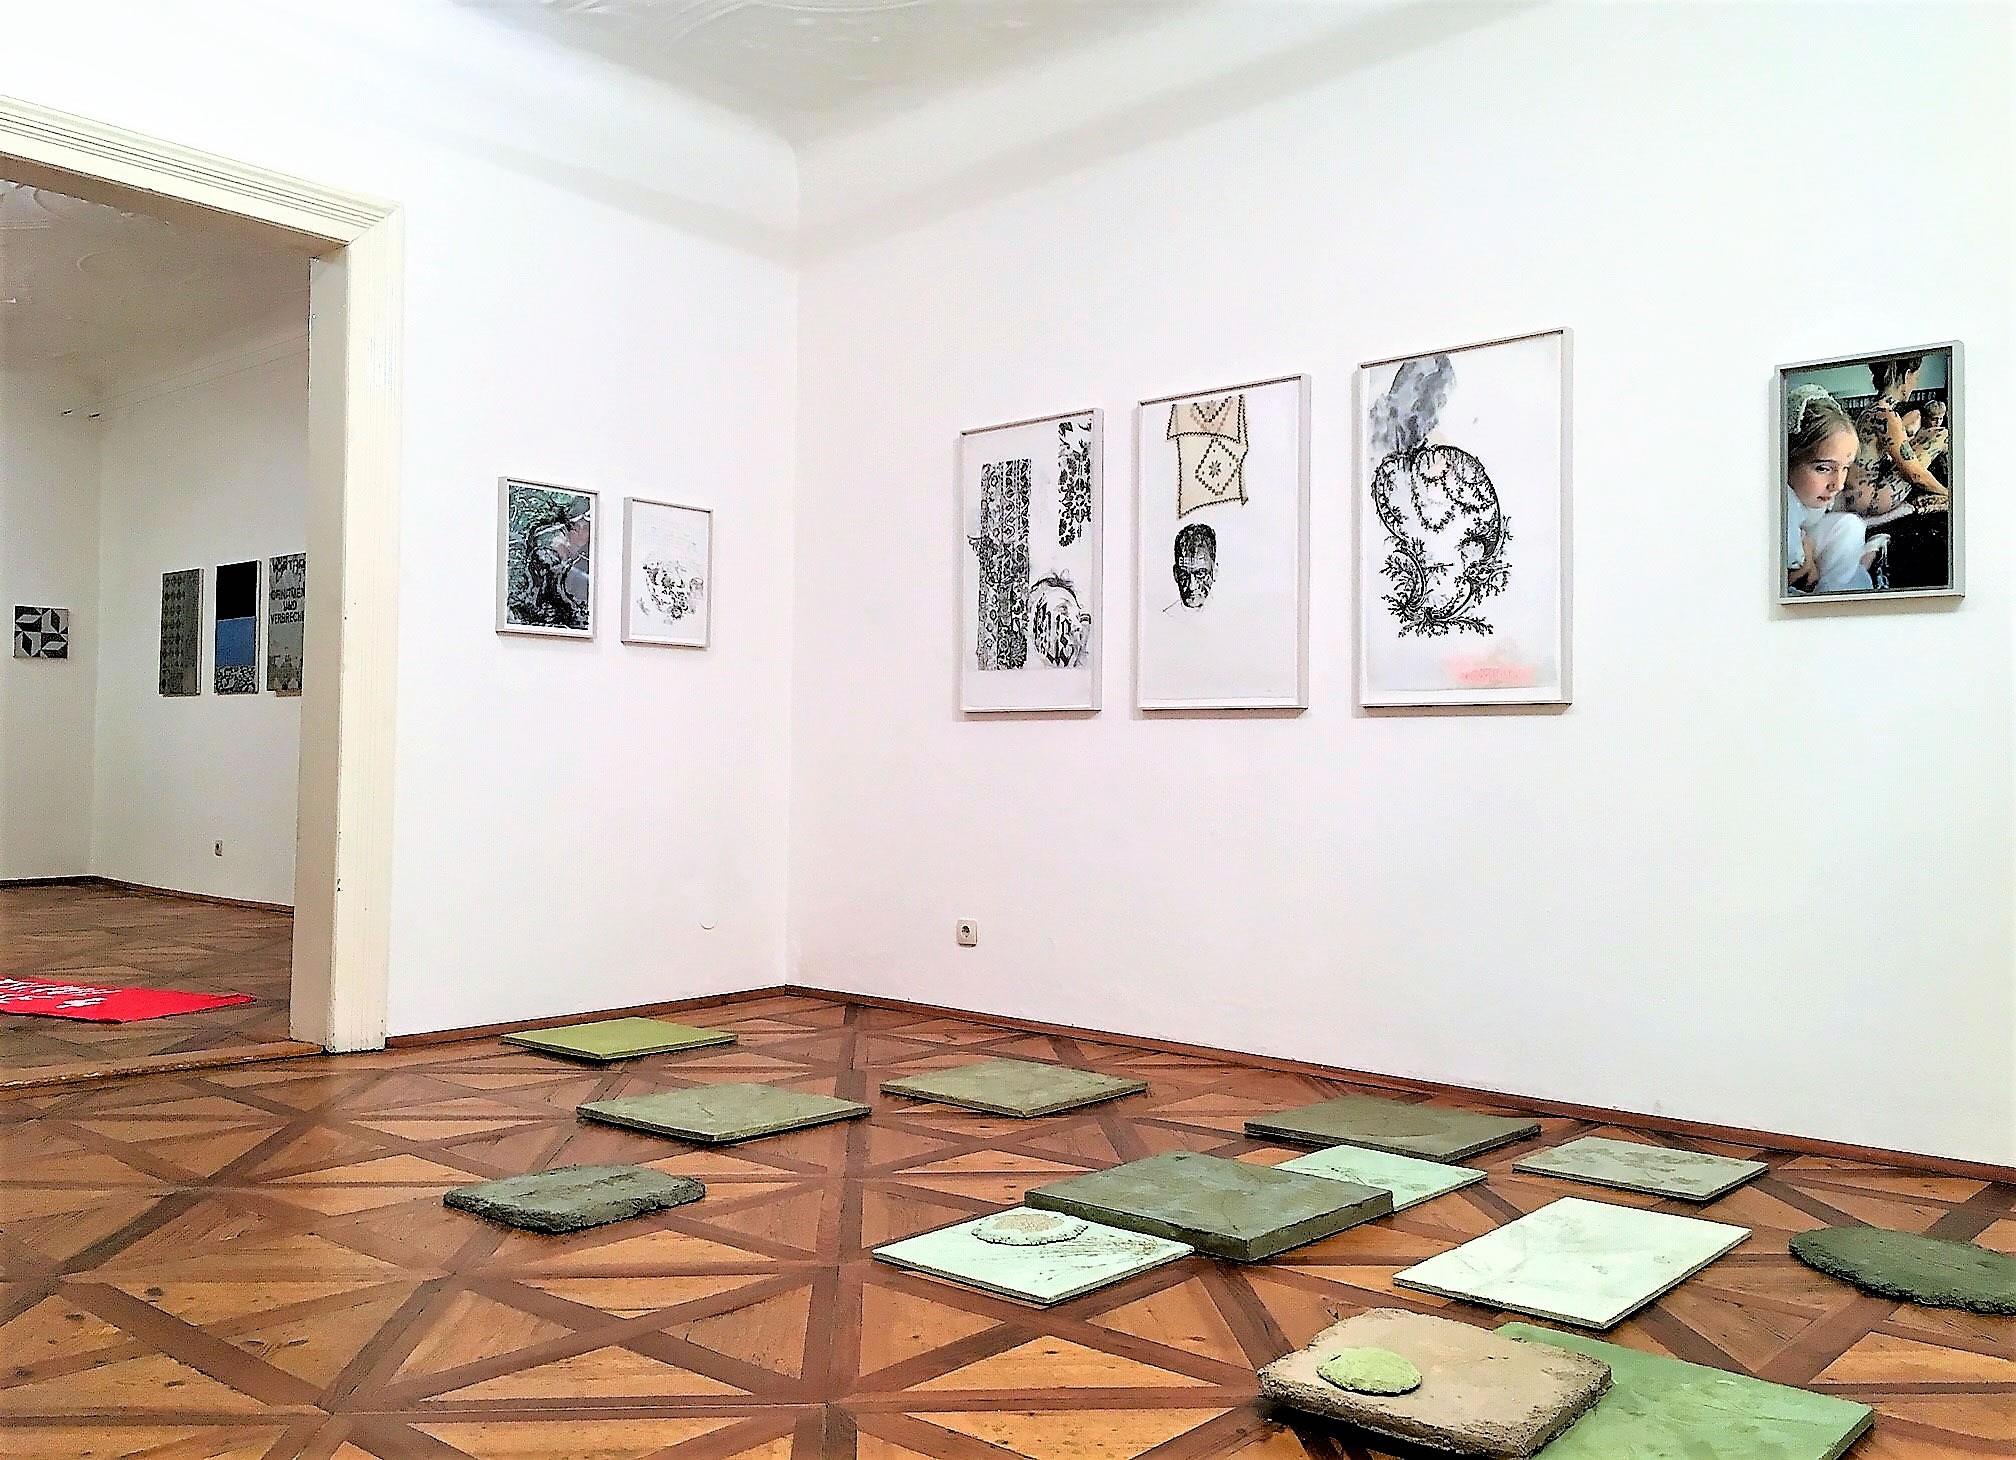 Iris Adraschek | Hubert Lobnig | Raum 2 Raum 1